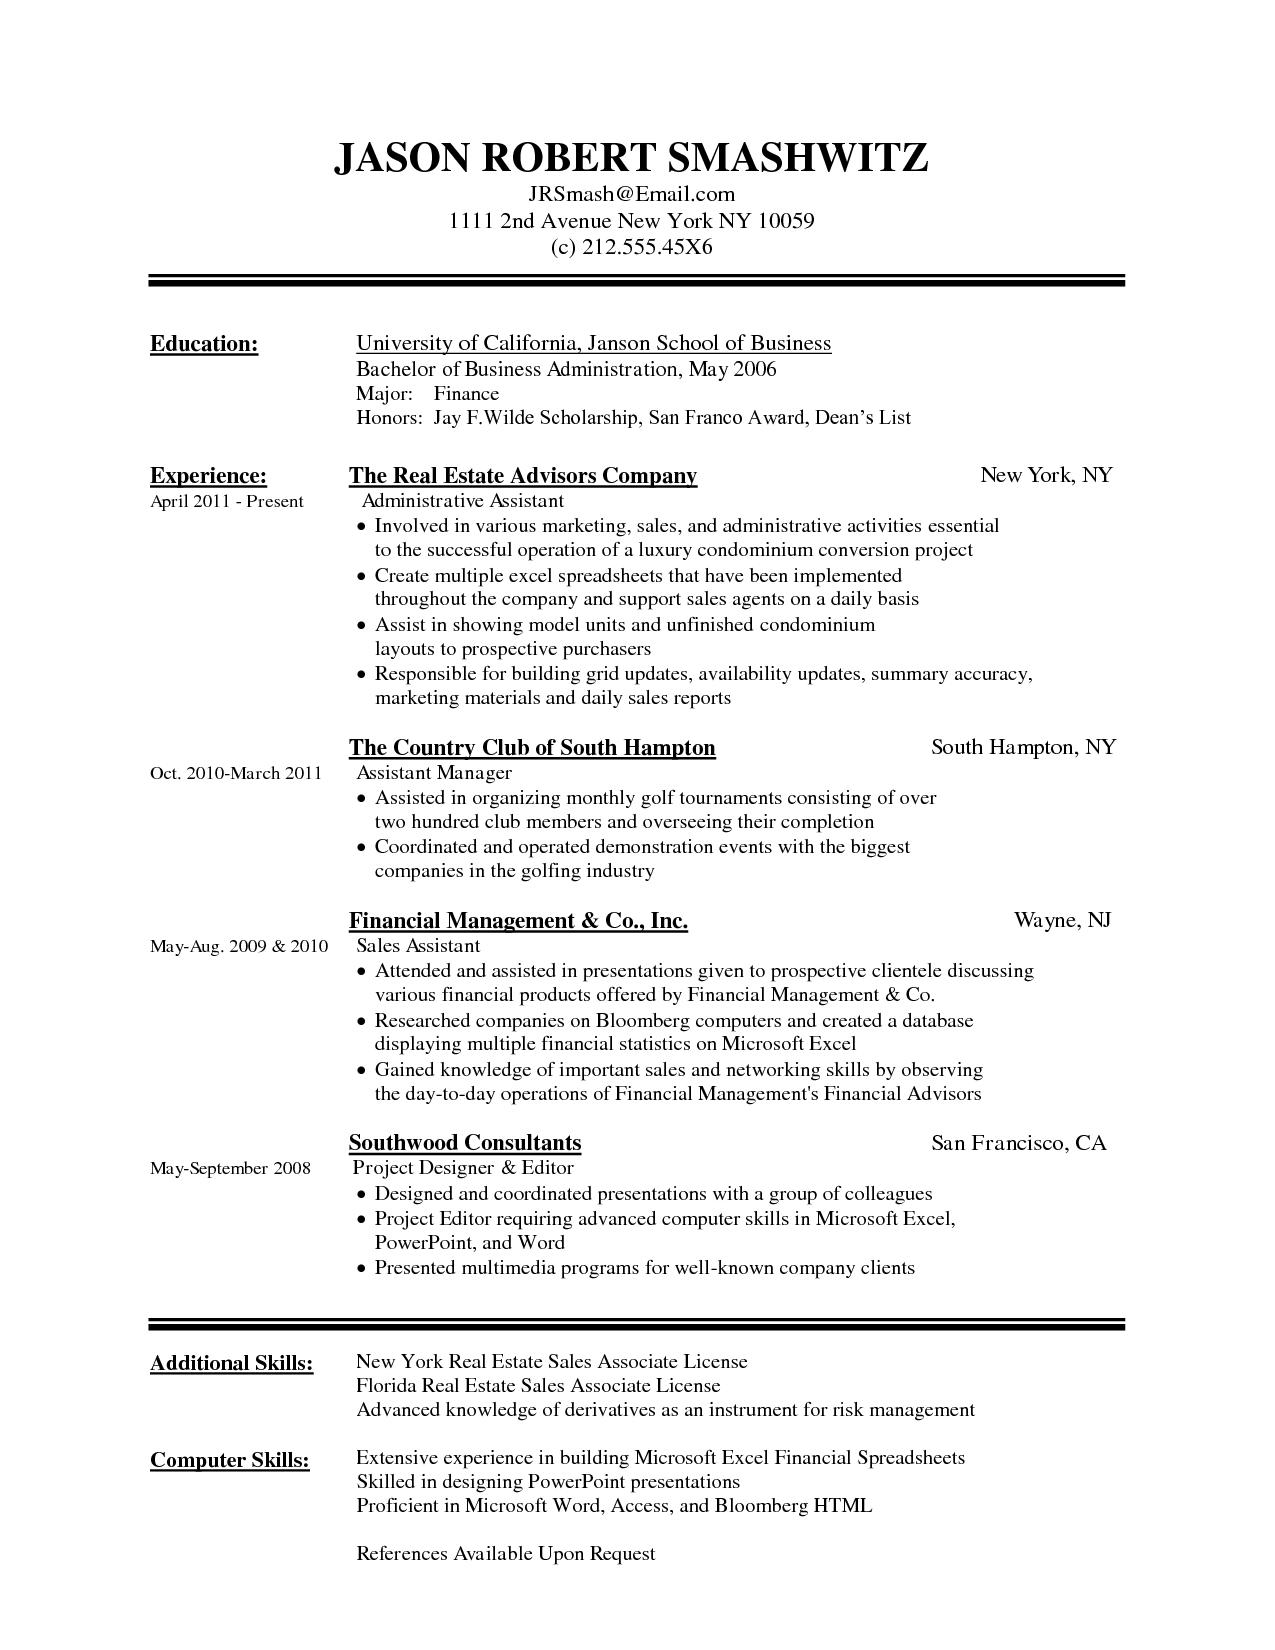 microsoft word document checklist template